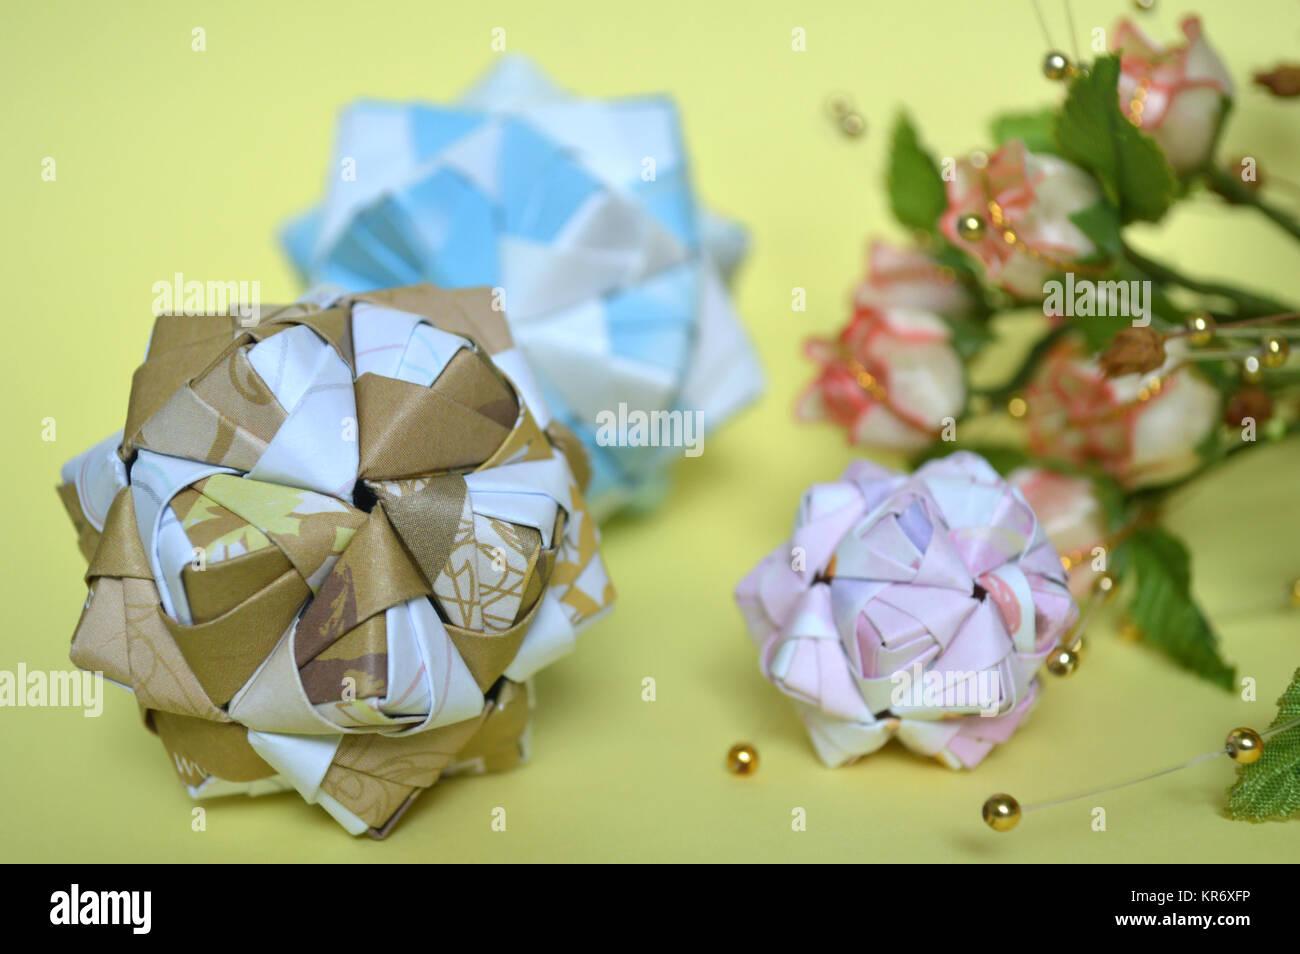 Modular Origami Sonobe Ball On Yellow Background Stock Photo